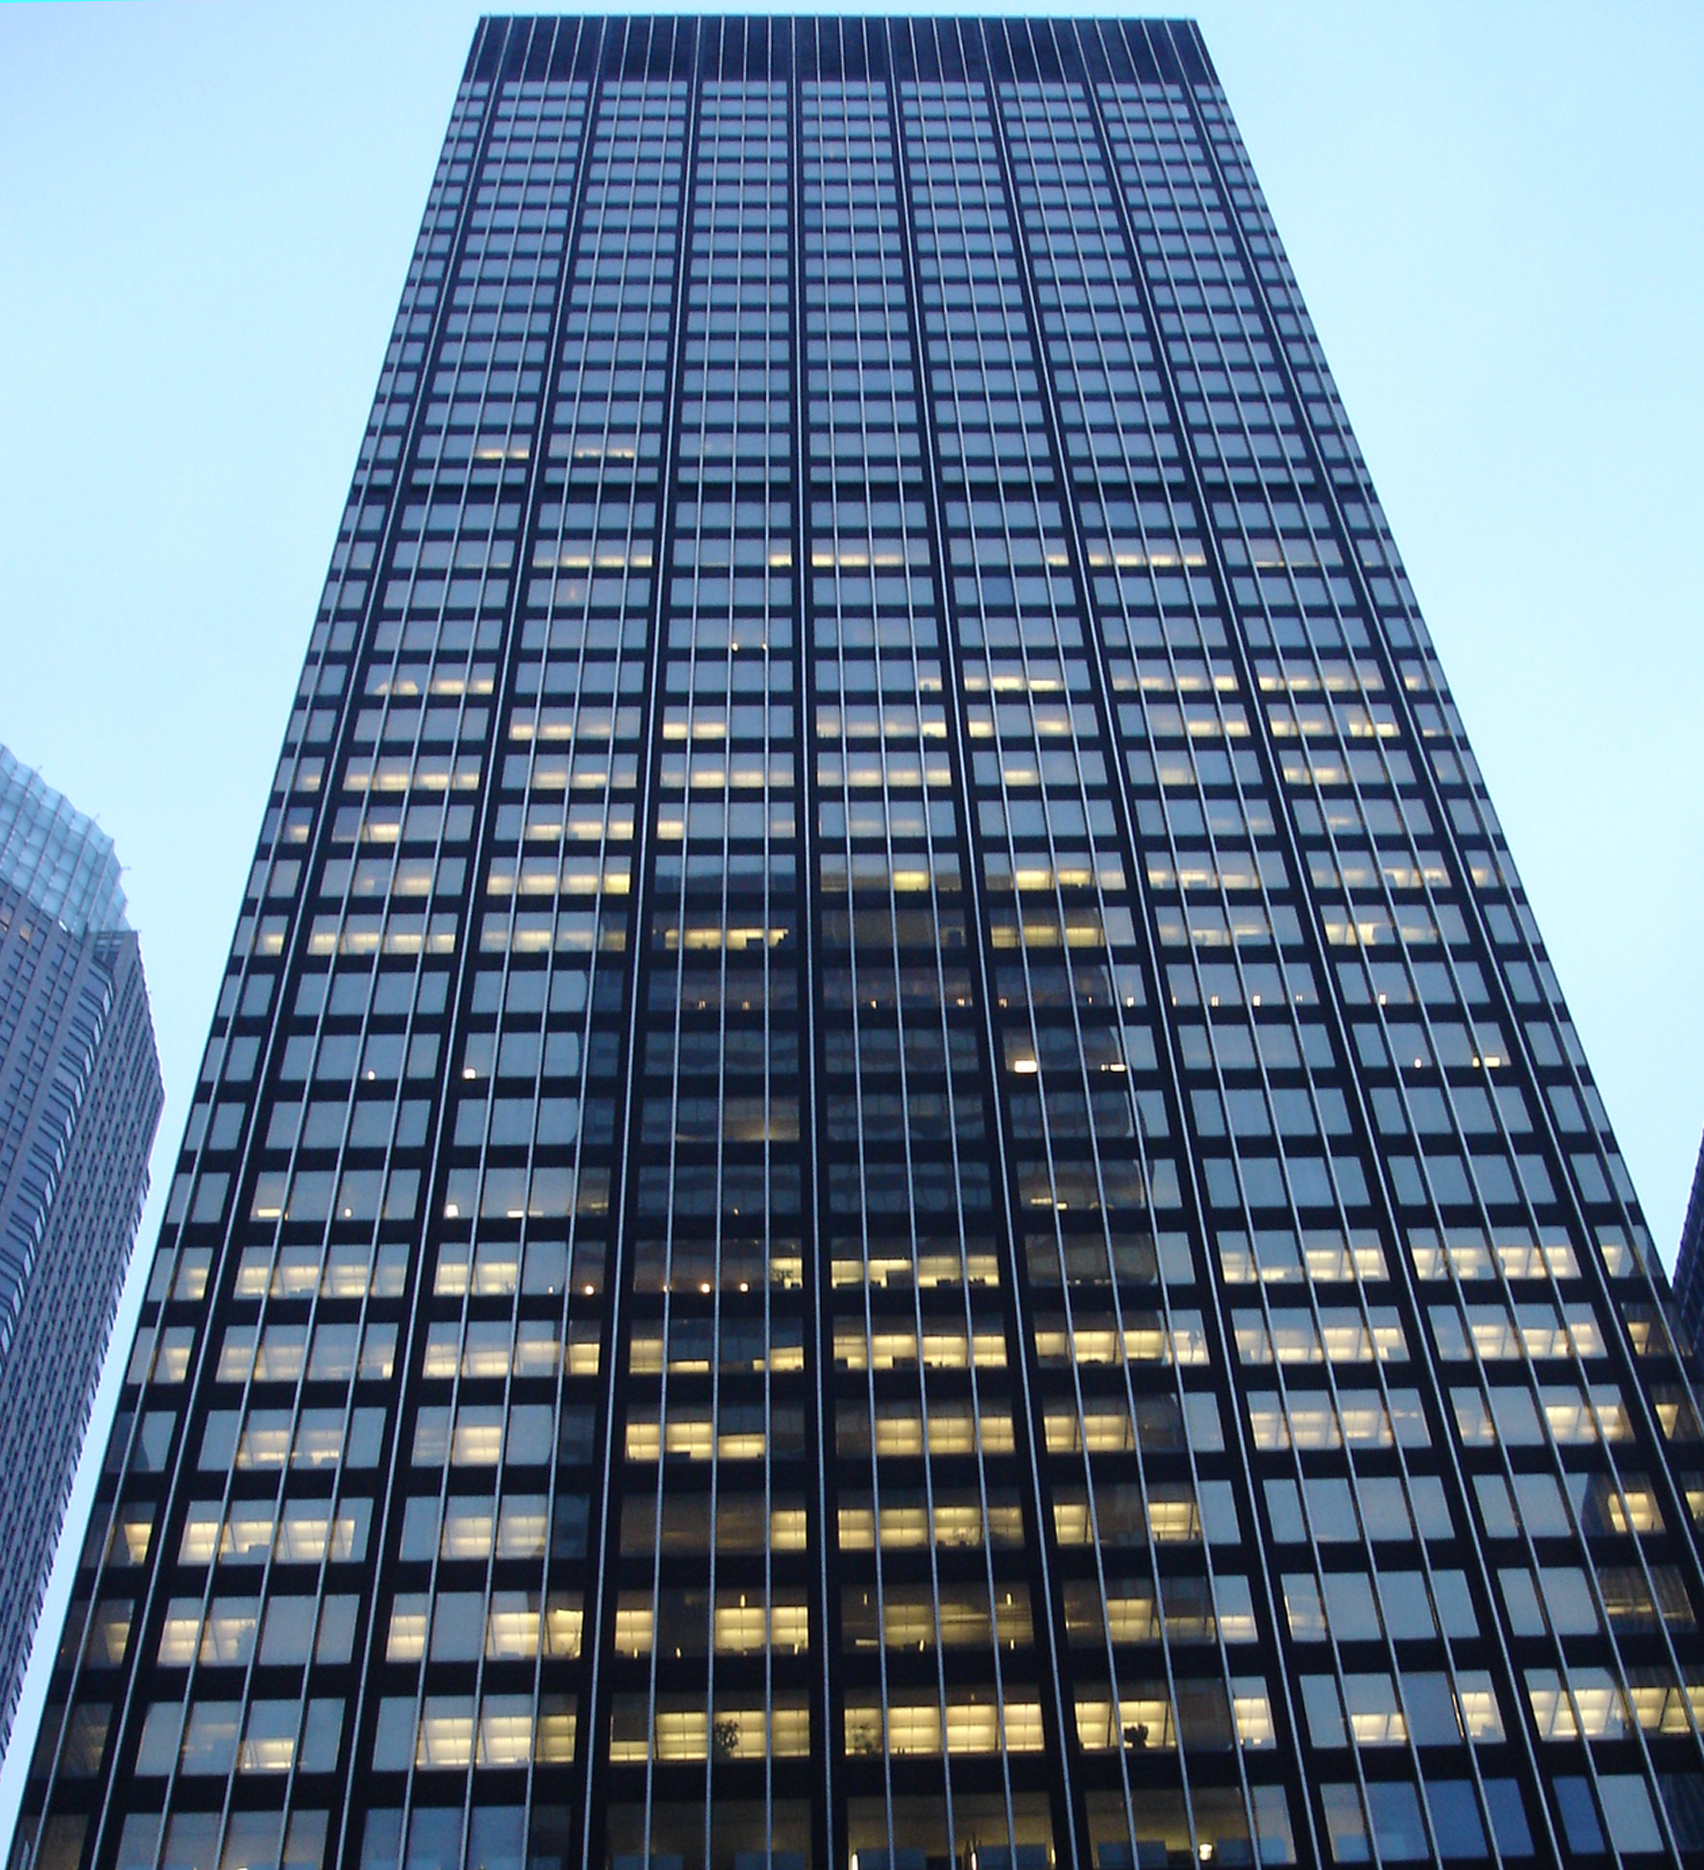 SOM's modernist Park Avenue skyscraper faces demolition